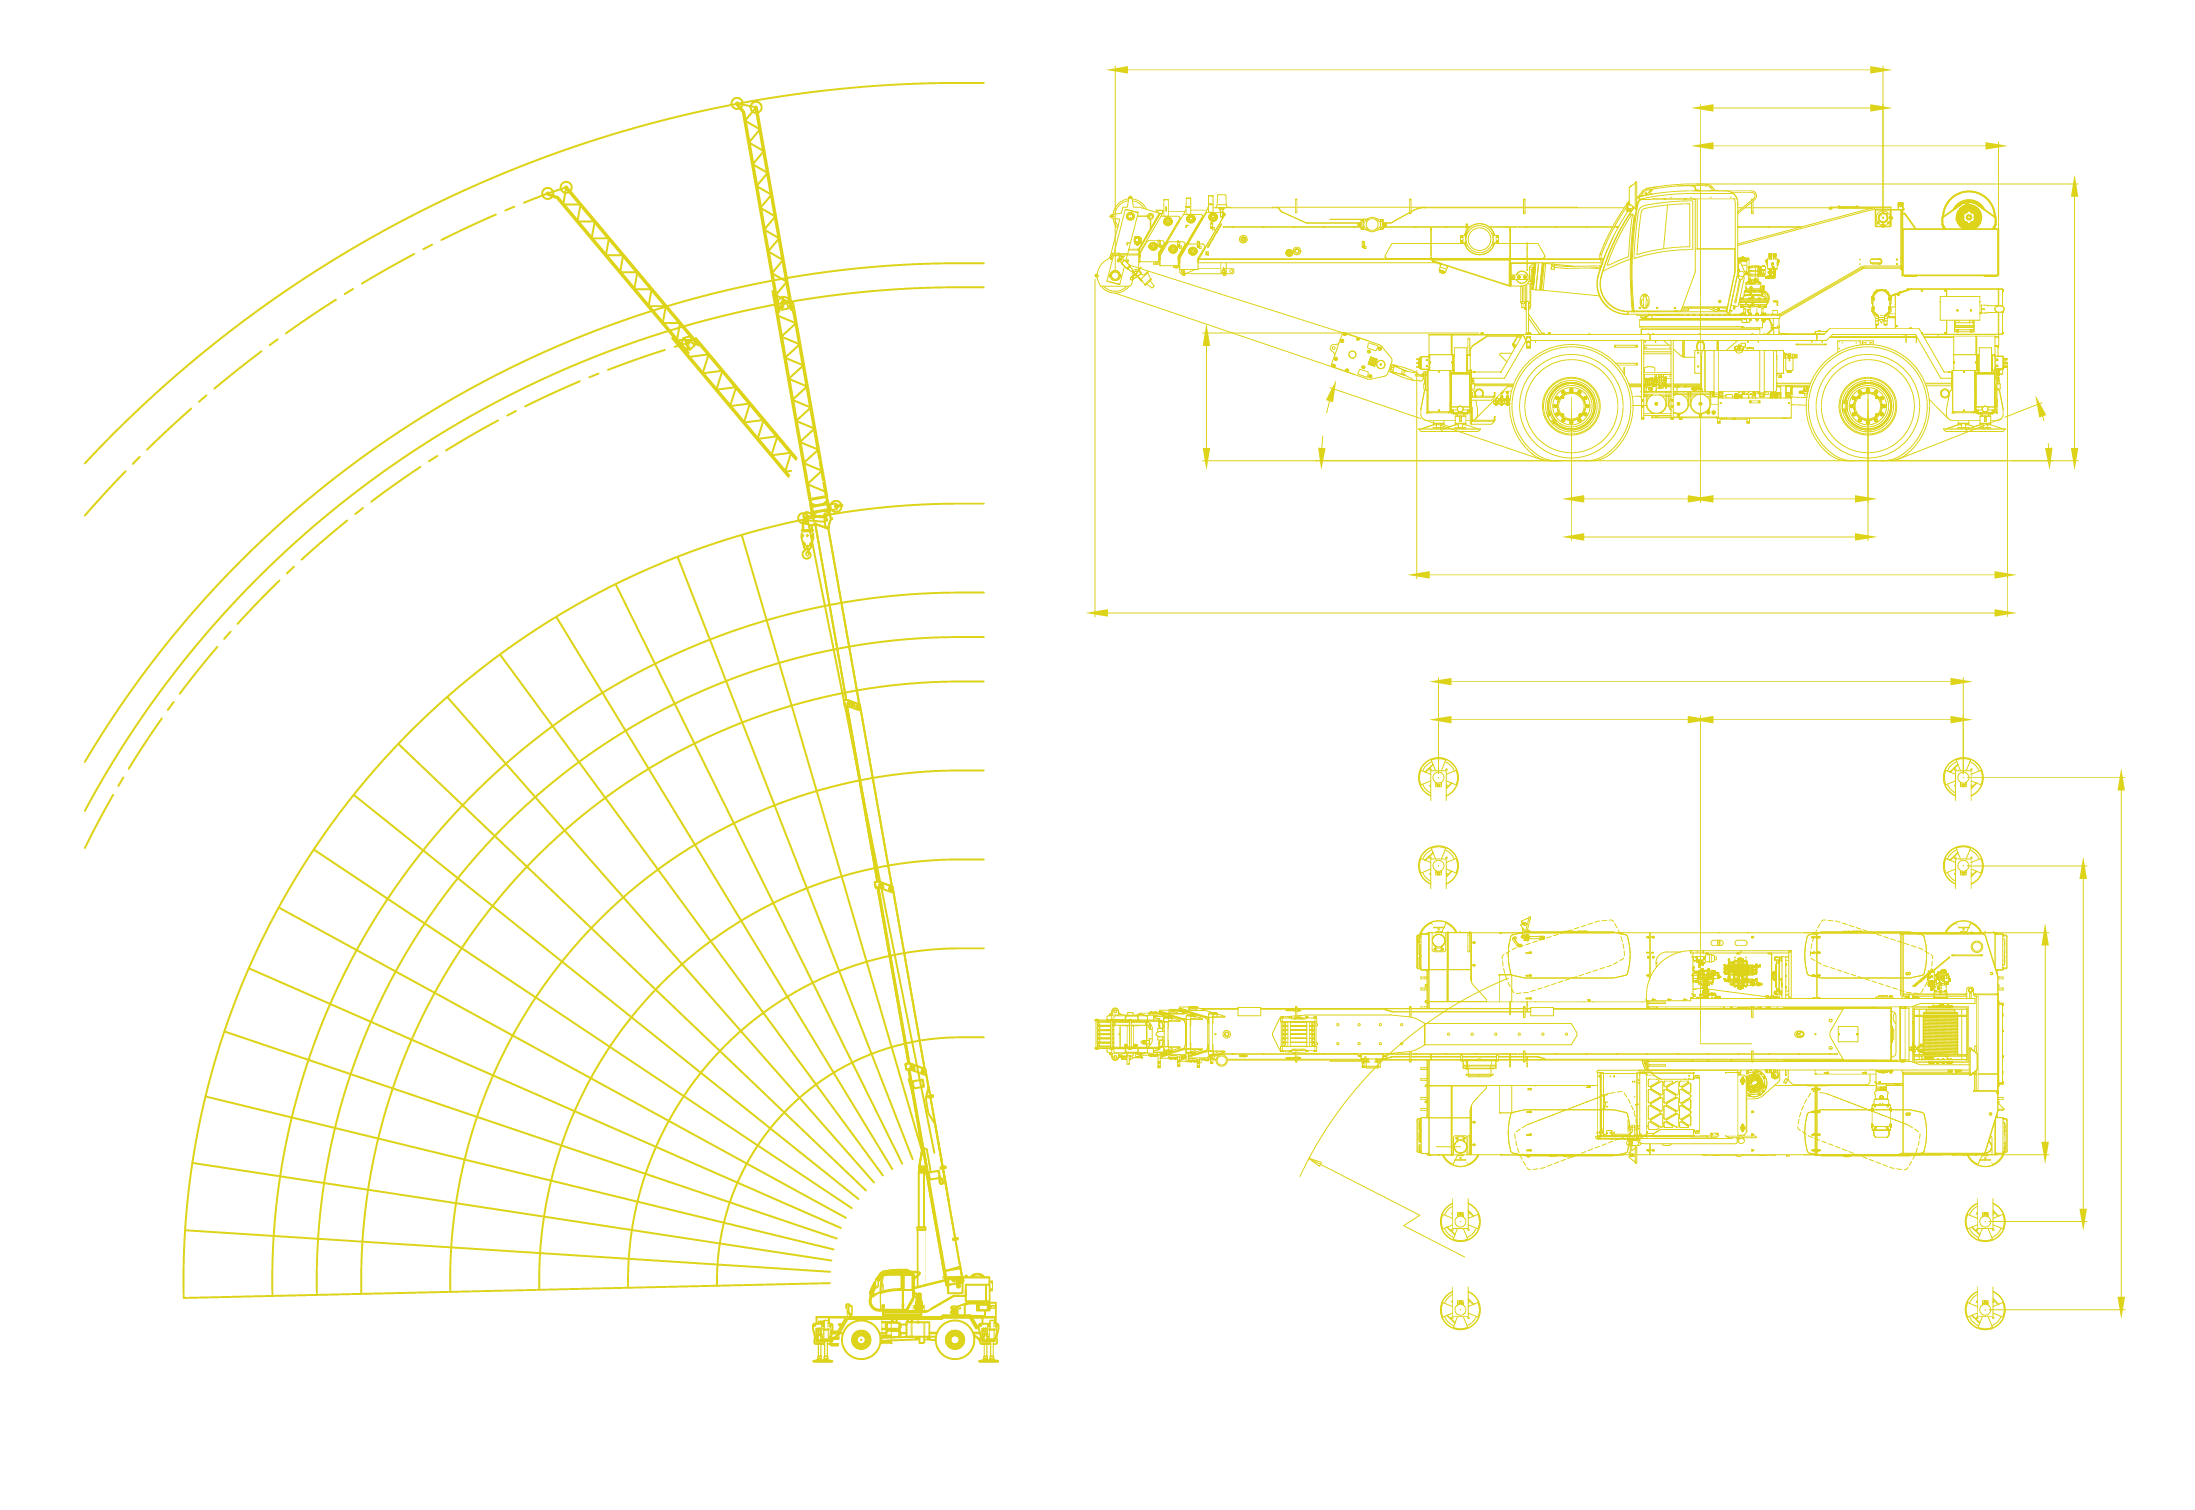 Locatelli - Gril 70.65 Working Envelope and Machine Diagrams